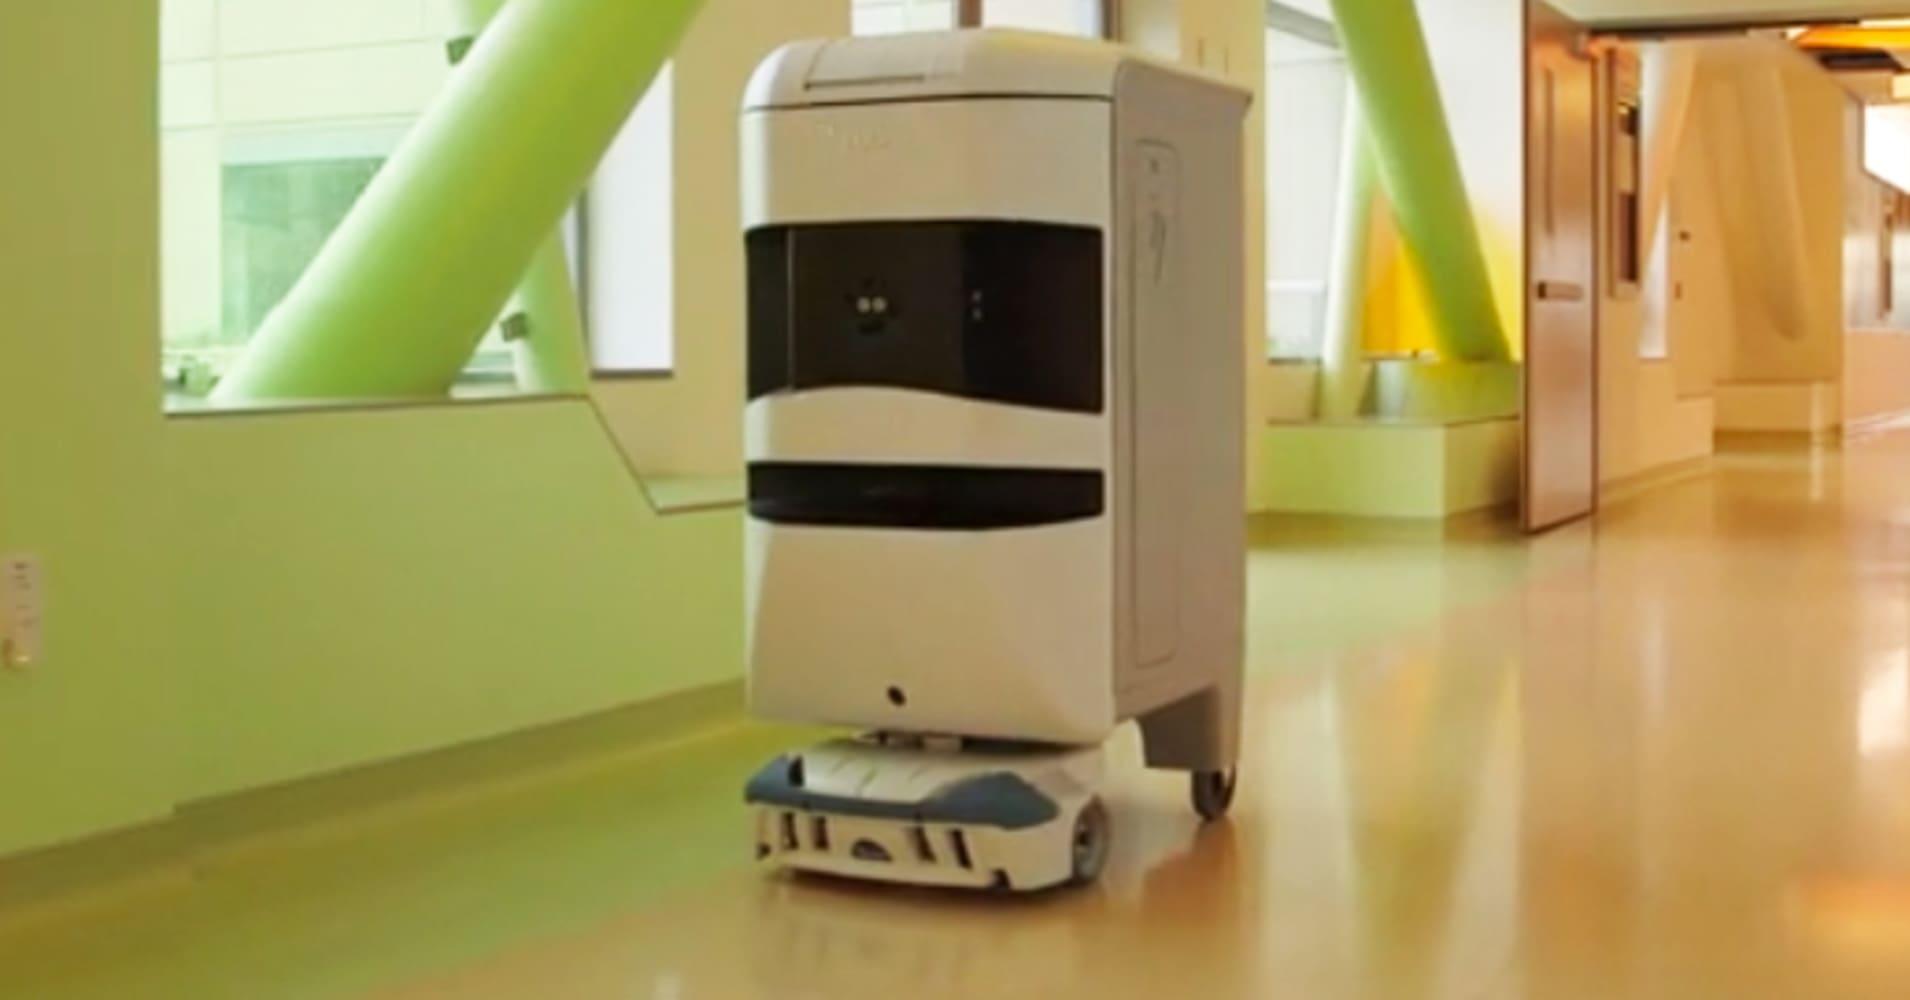 Pricy Robots Tug Hospital Supplies